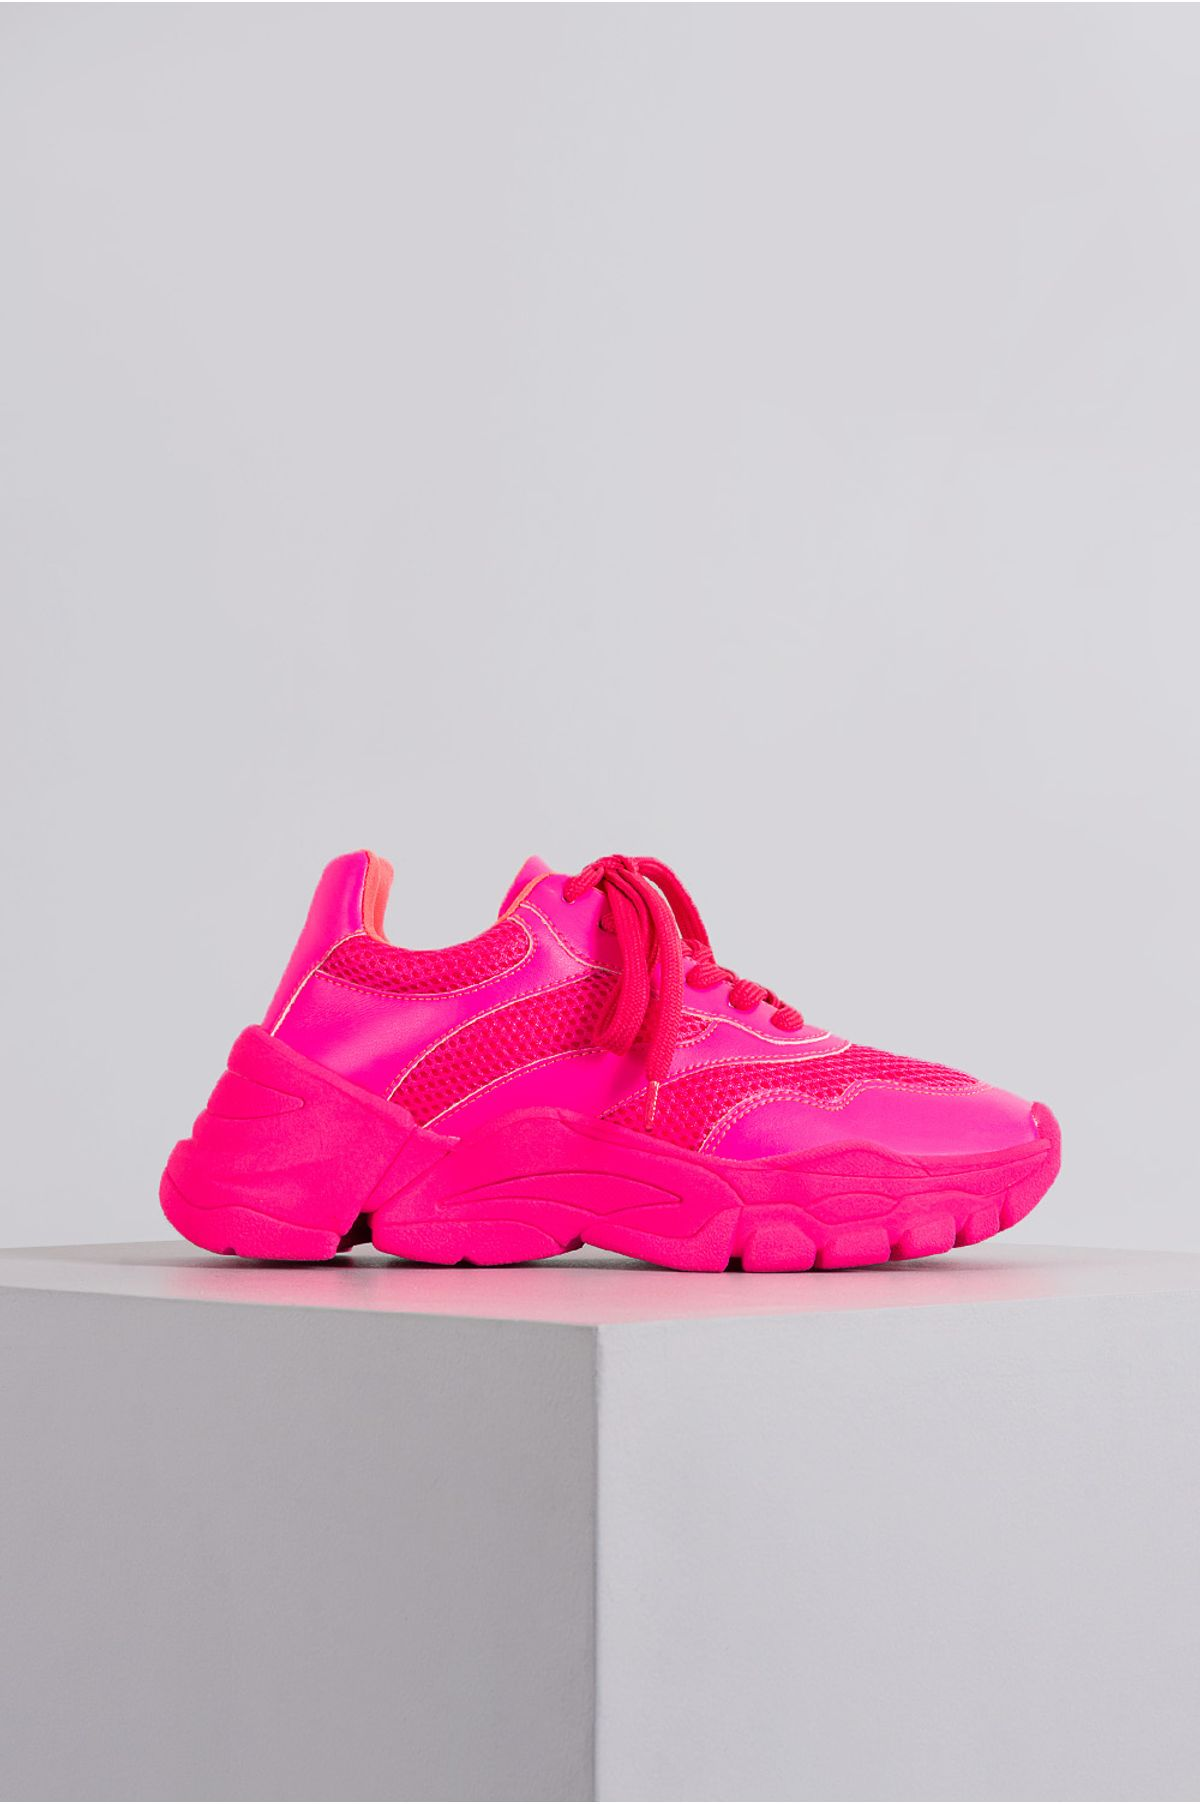 garantia limitada olhar bons sapatos venda comprar popular